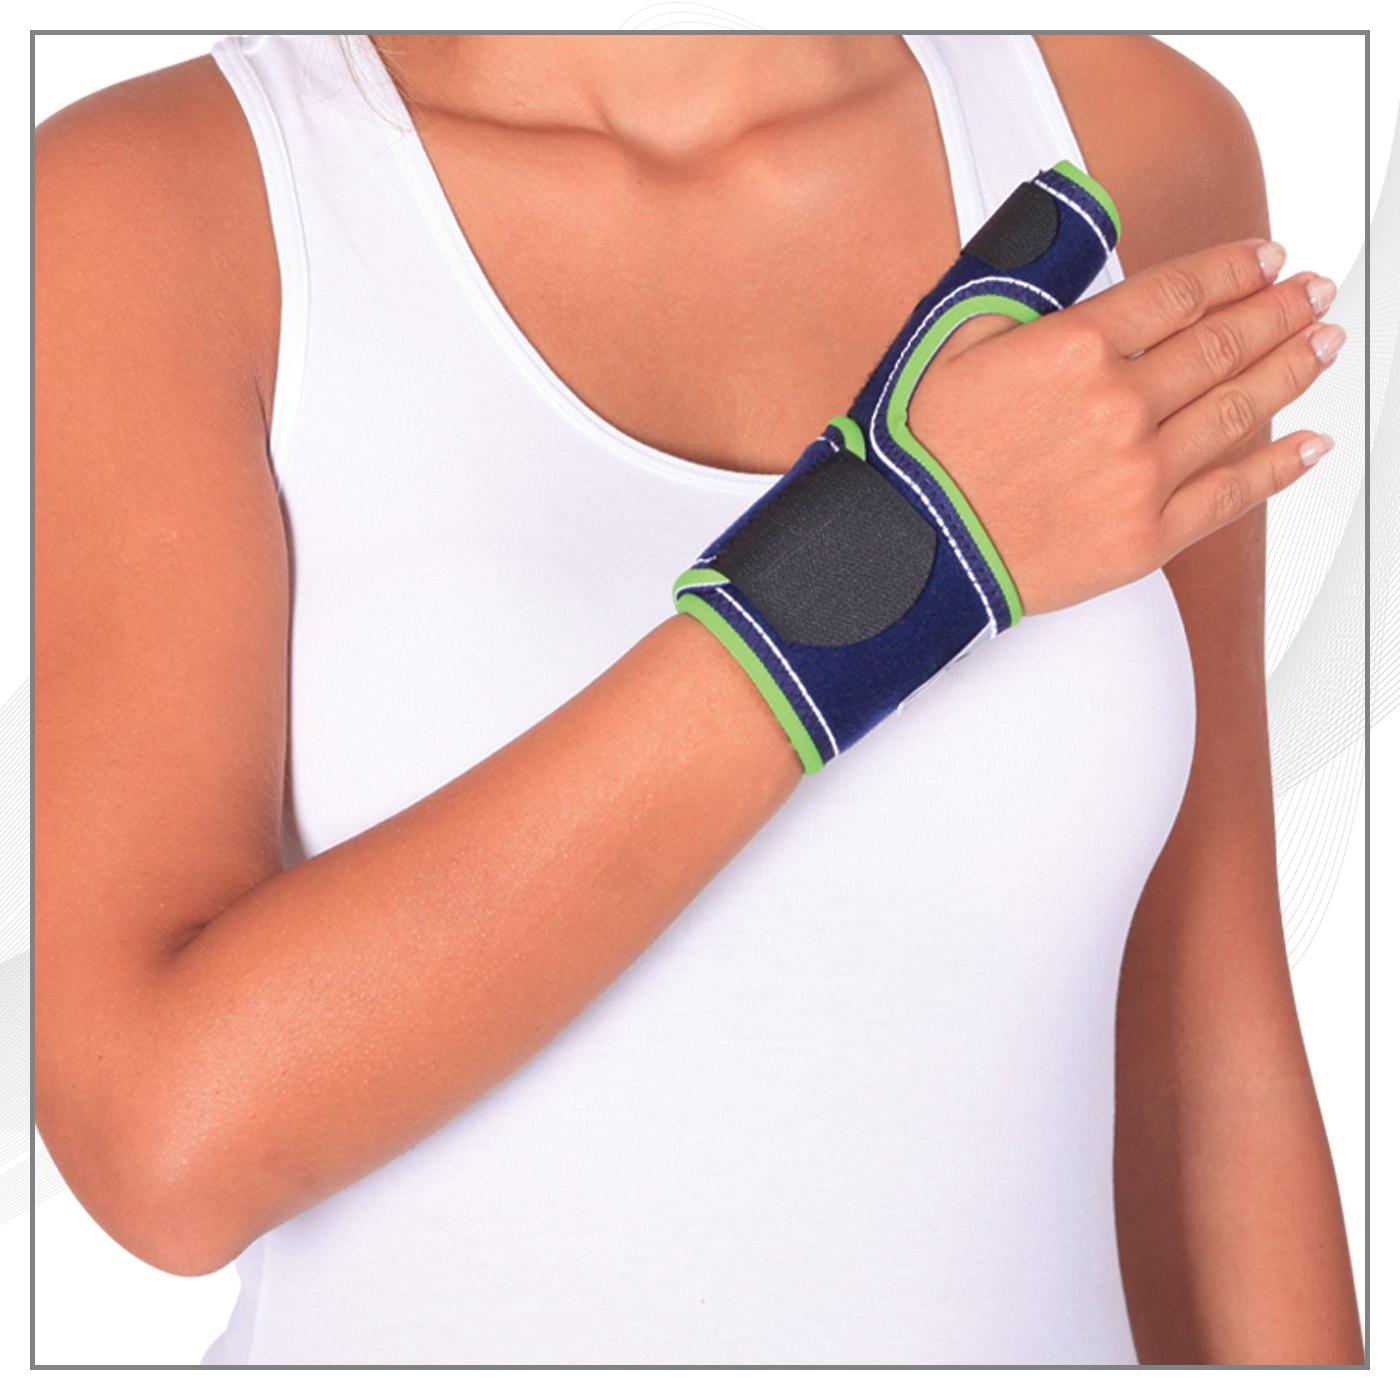 wrist and elbow brace hb 5303 abc